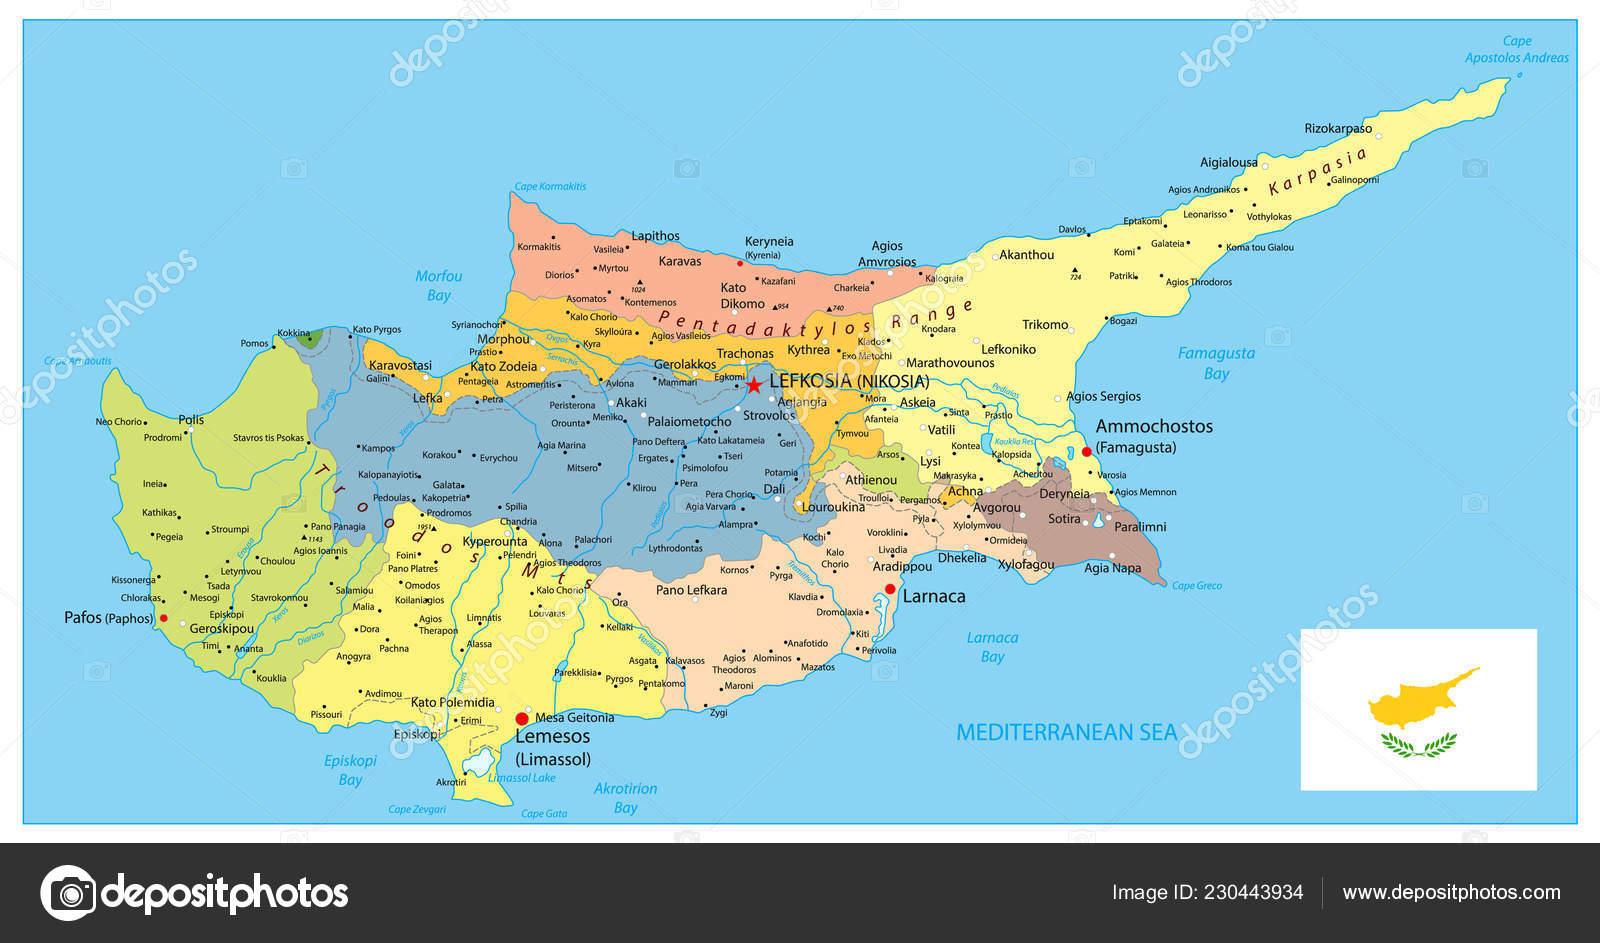 Karta Famagusta Cypern.Cypern Politiska Karta Detalj Administrativa Vektor Karta Over